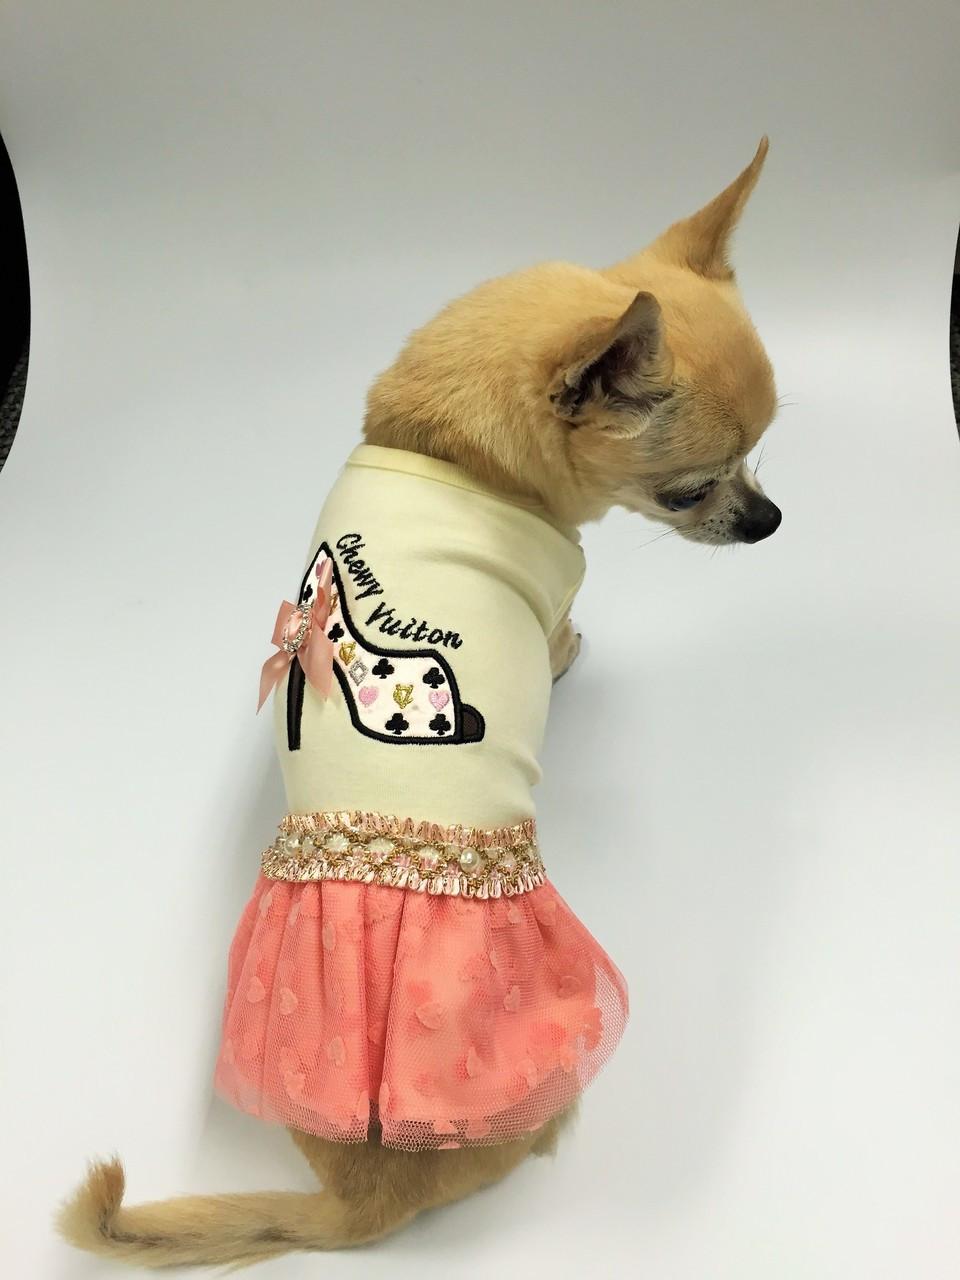 Chewy Vuiton Heel Ribbon Shoe Coral Heart Dress & Chihuahua Clothes Chihuahua Clothing - FunnyFur.com